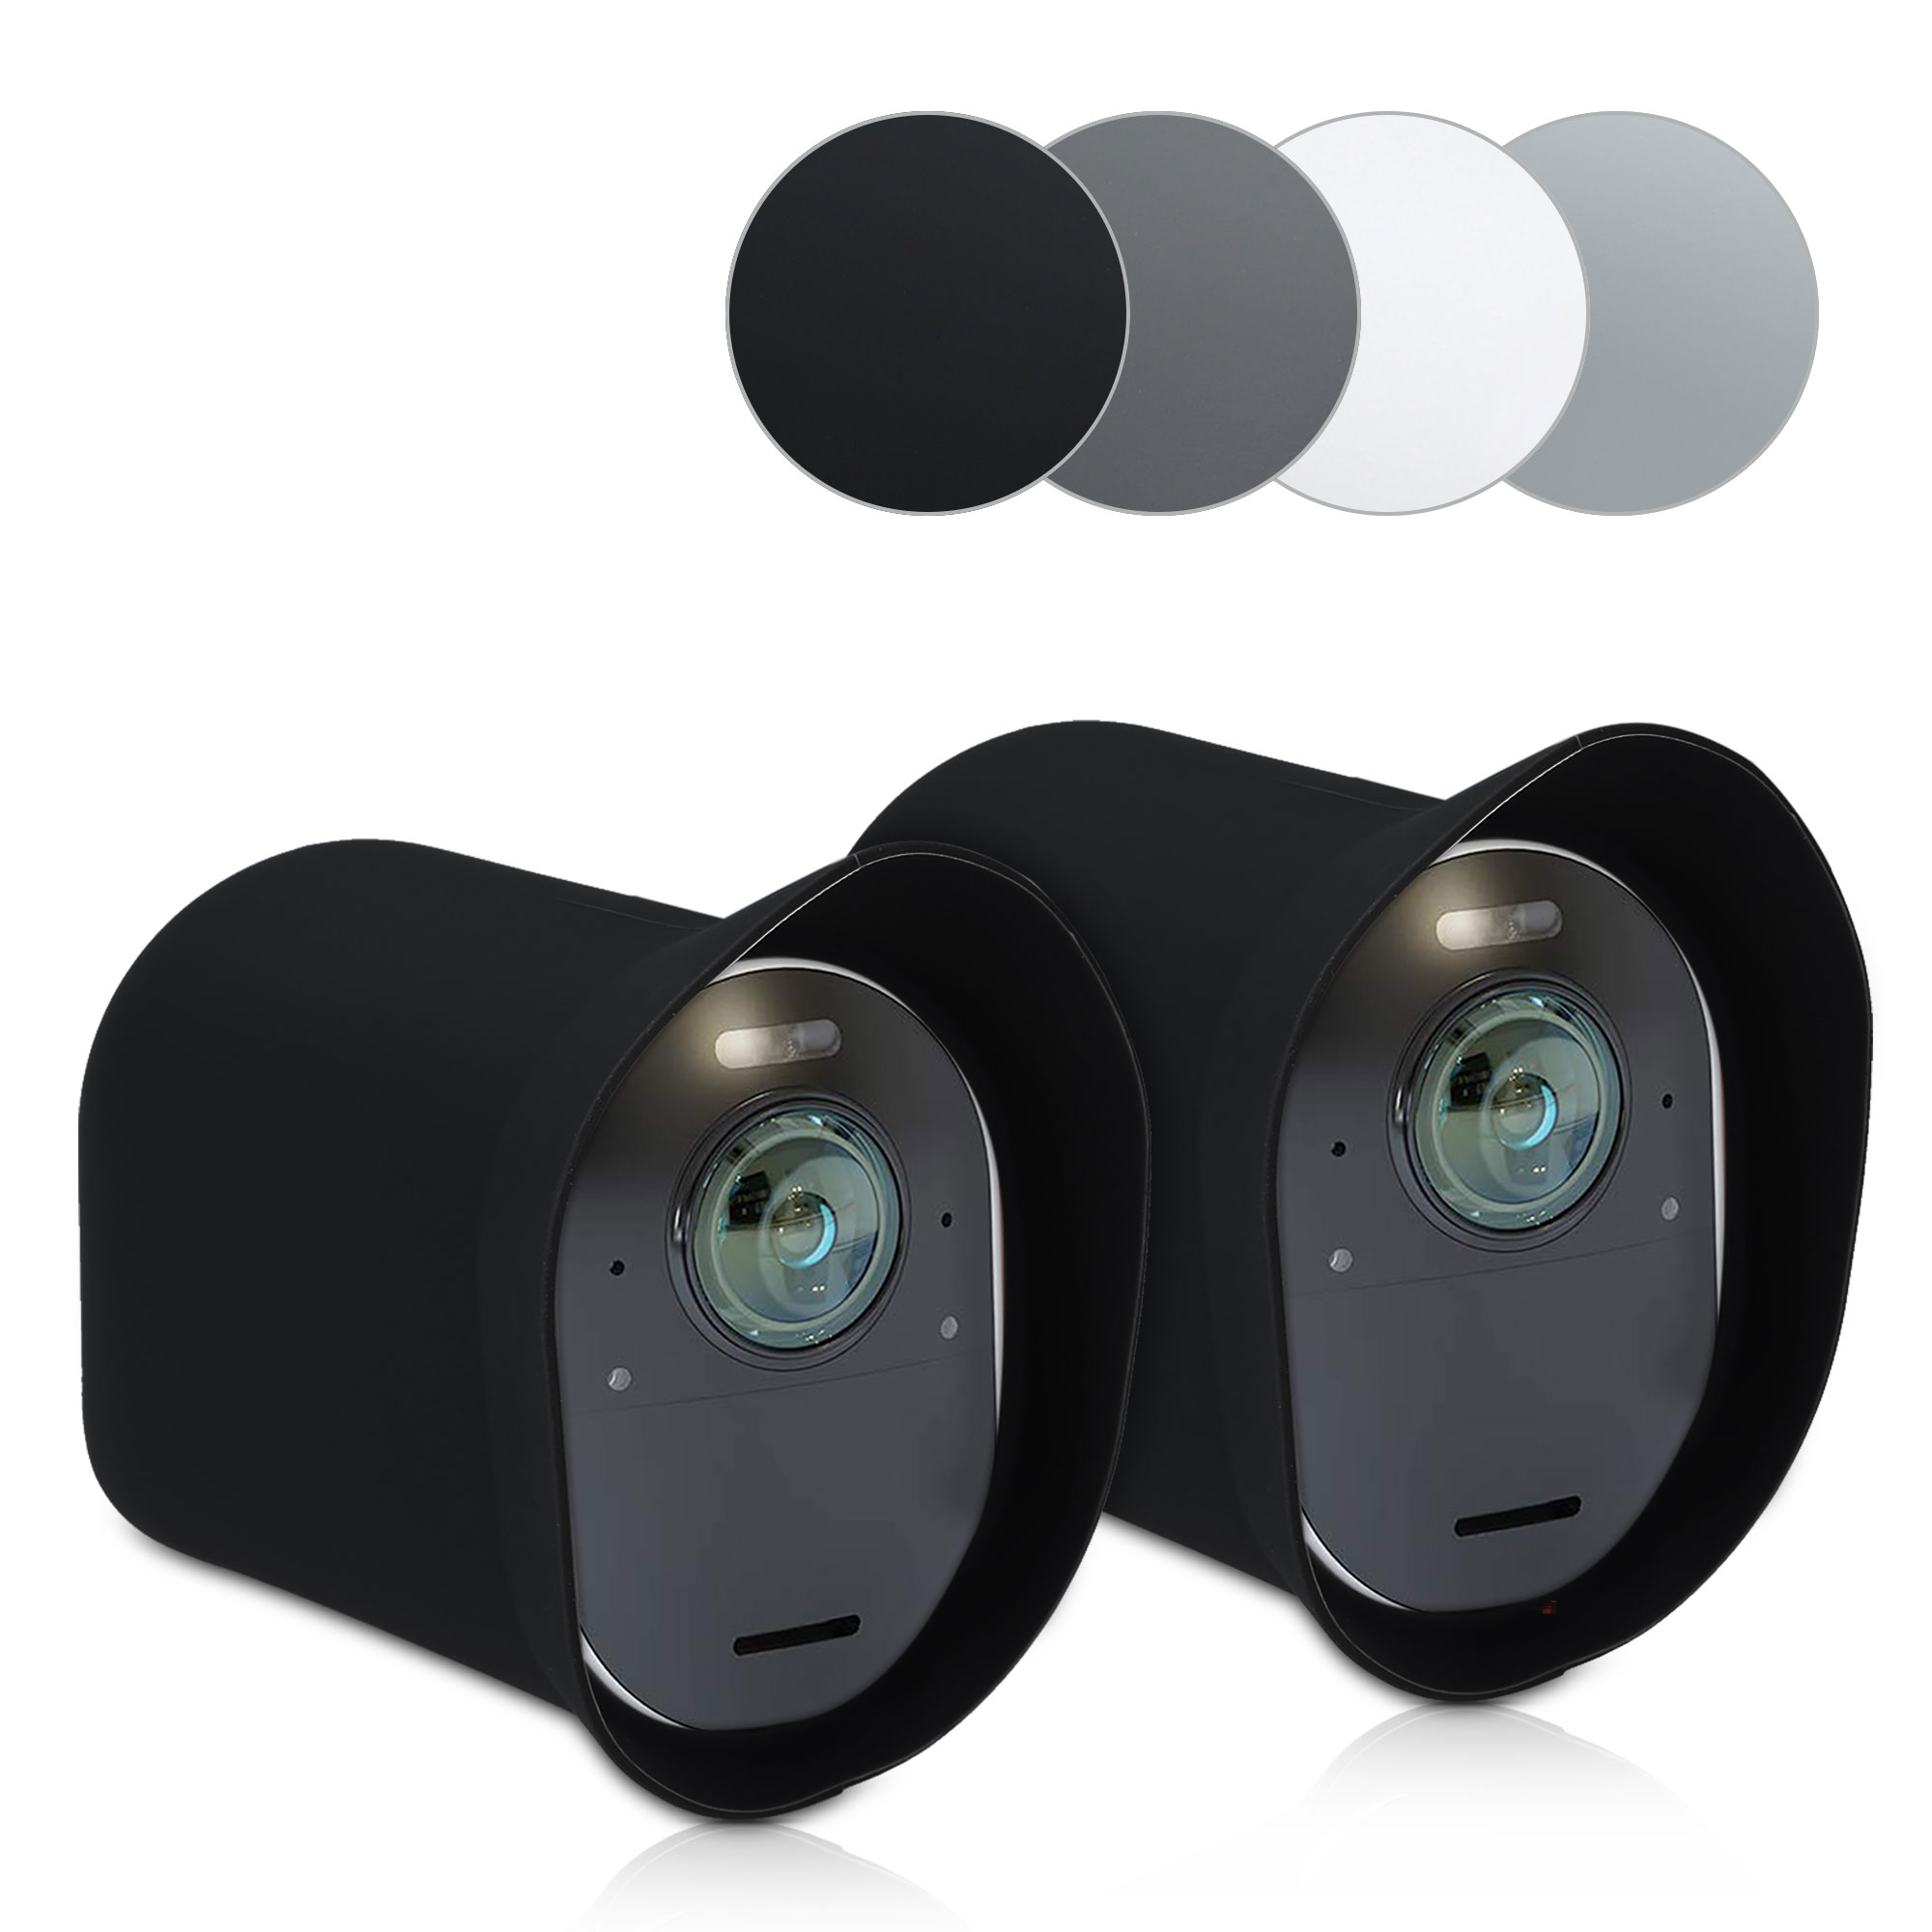 Silikon Security Camera Cover Schutzh/ülle f/ür Arlo Ultra Kamera kwmobile 2X Arlo Ultra H/ülle